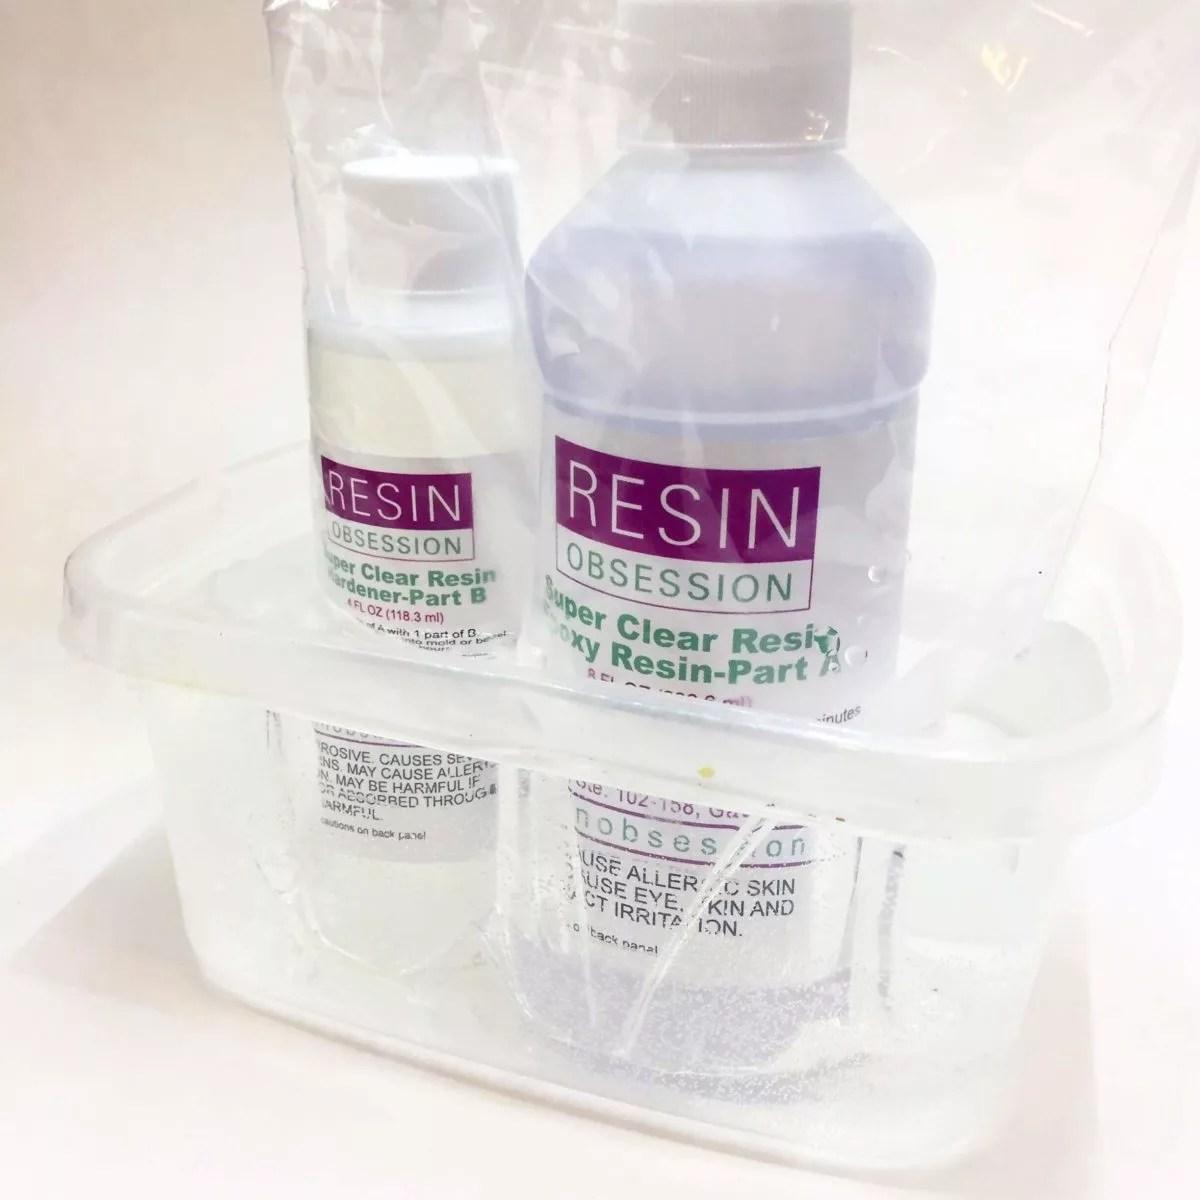 warming bottles of epoxy resin in a hot water bath